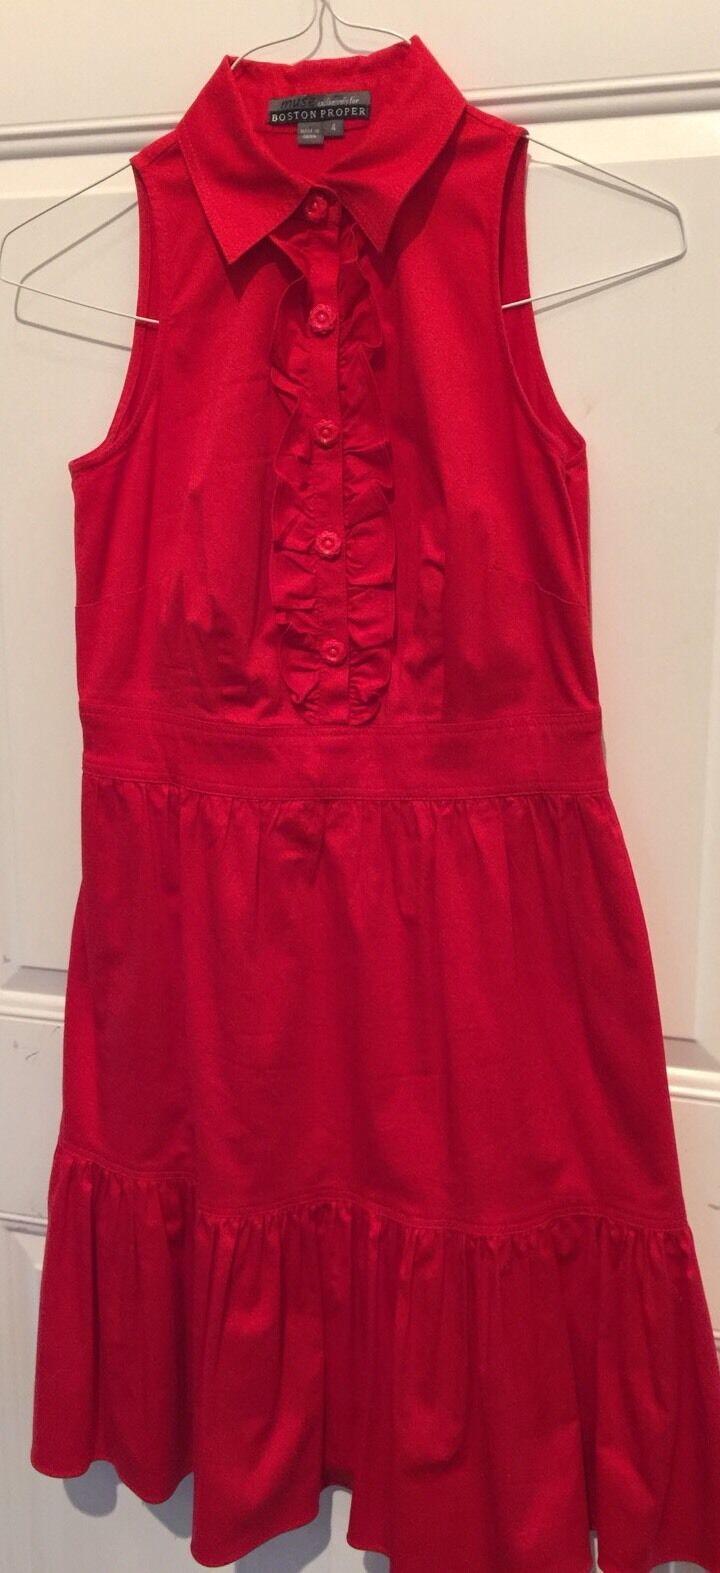 MUSE Boston Proper Red Ruffle Front Hem Summer Sundress Dress Size 4 Chest 32